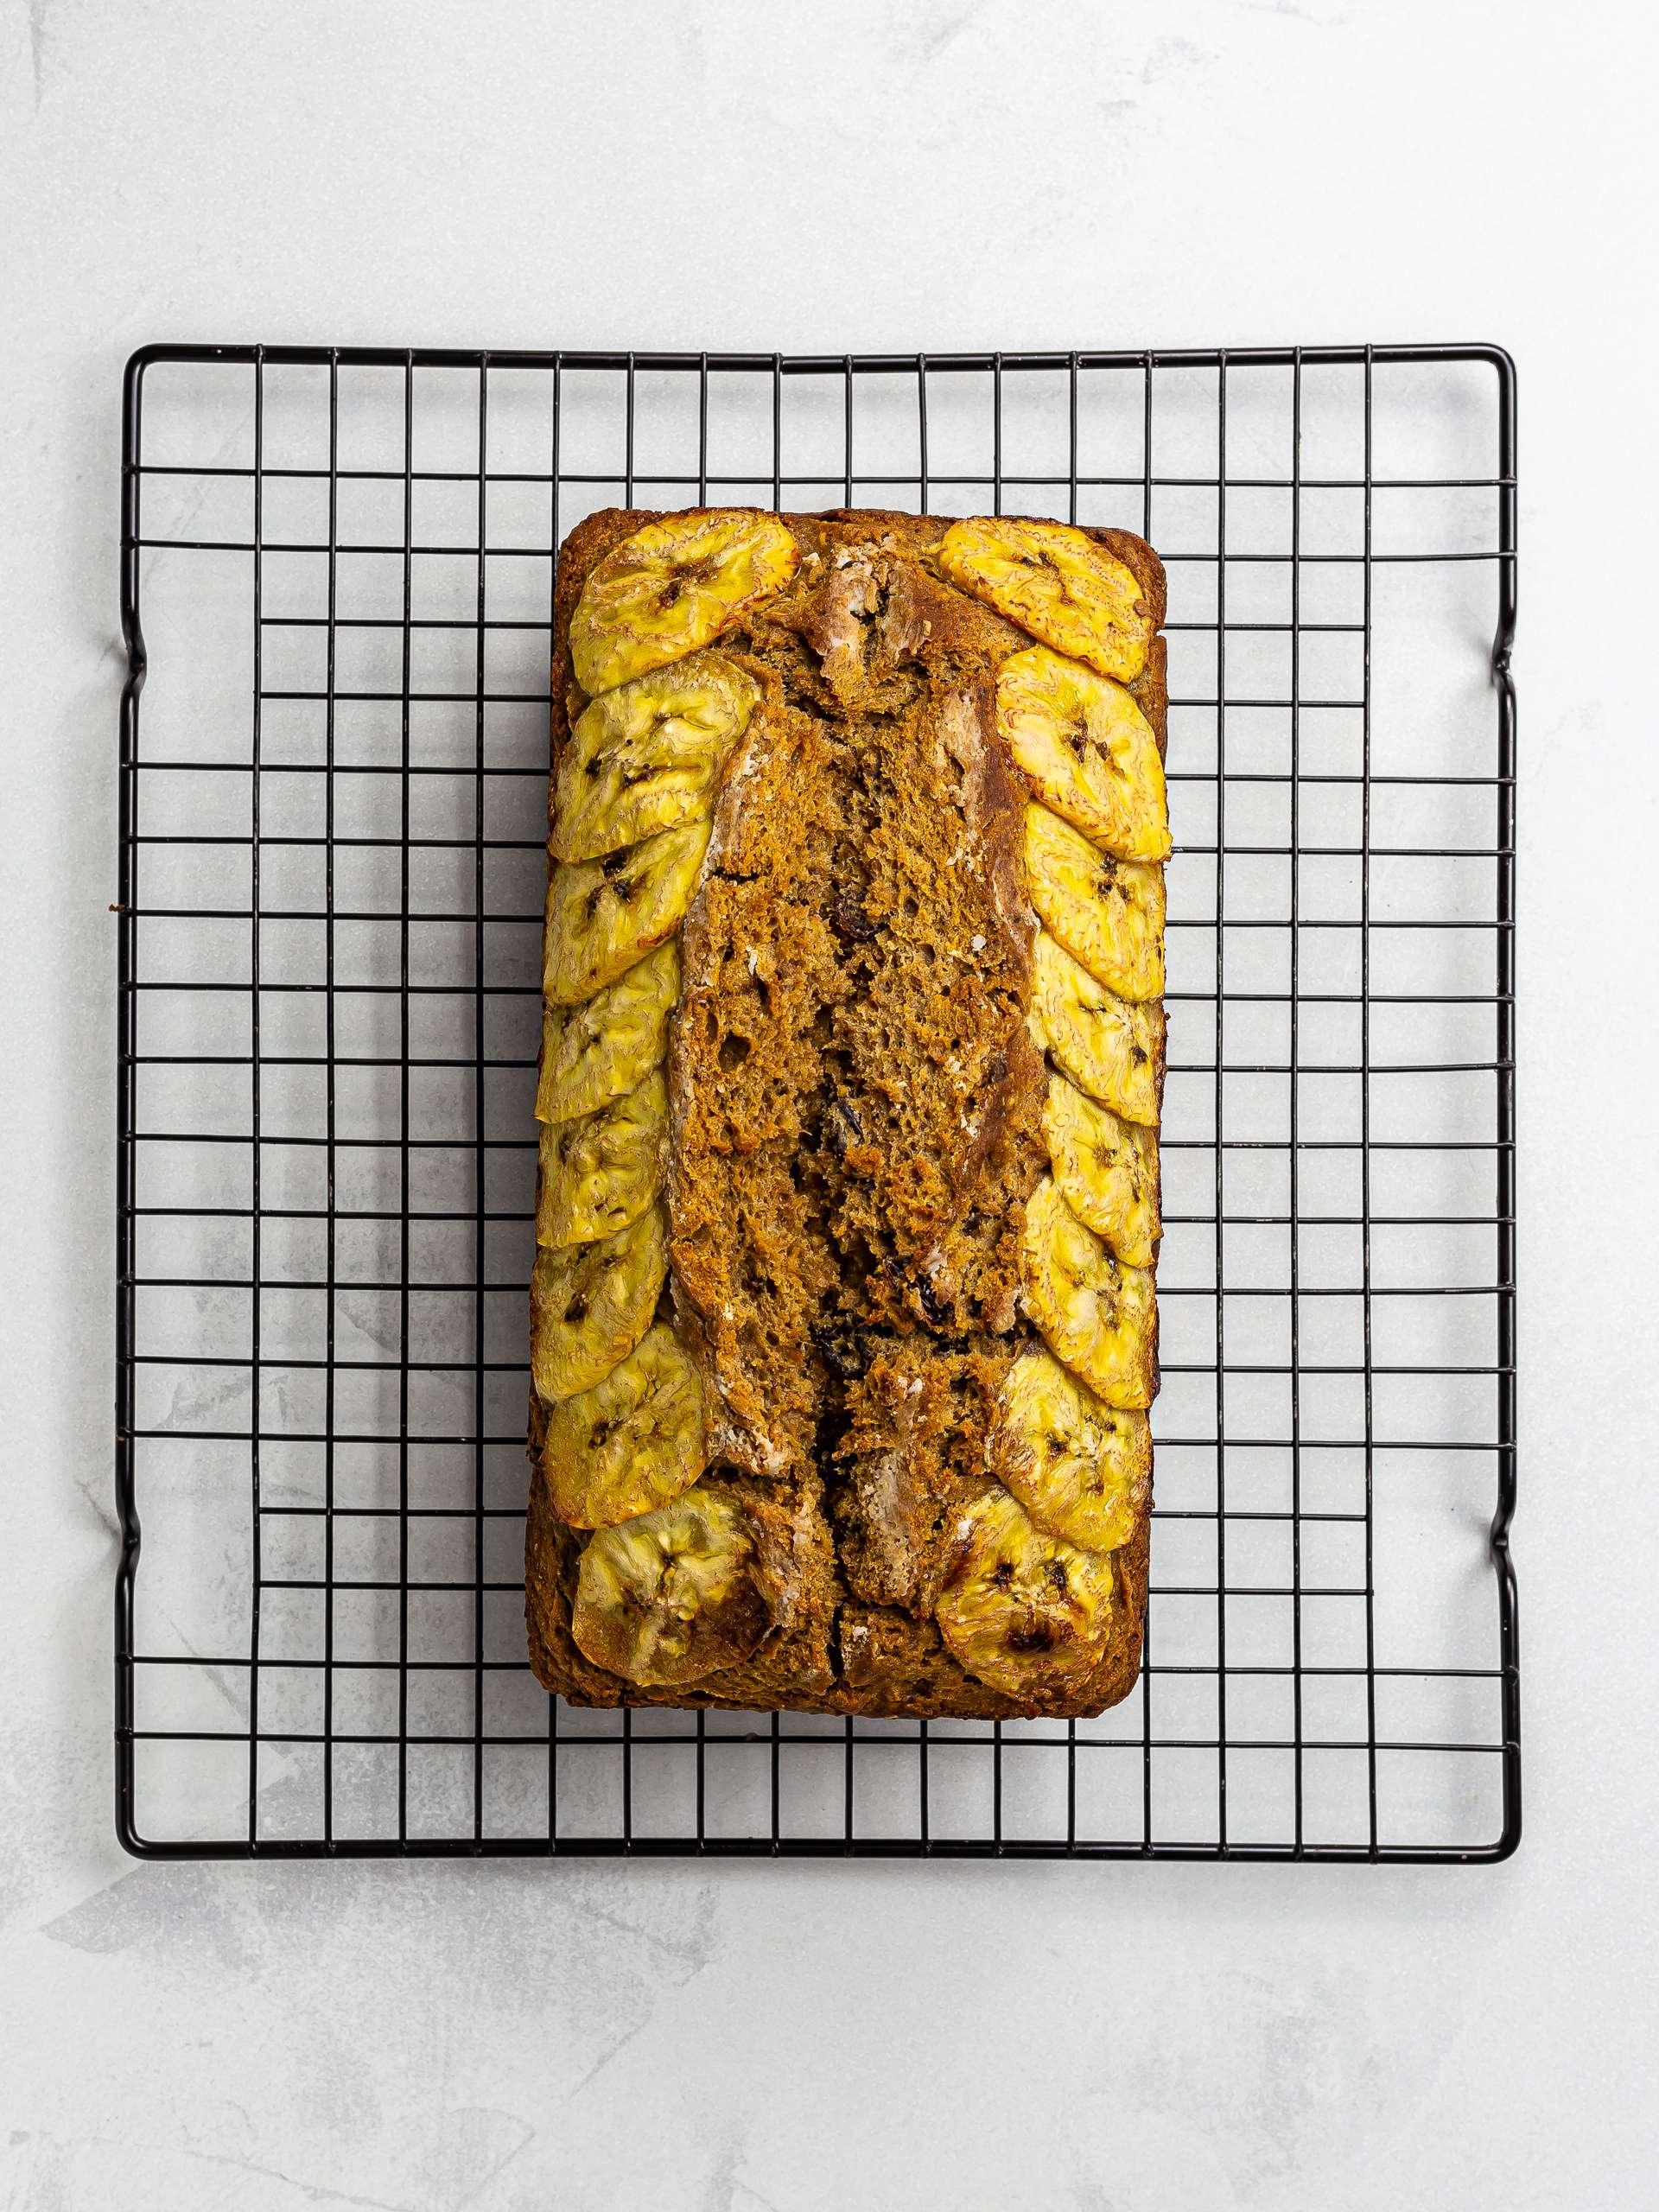 baked vegan plantain bread